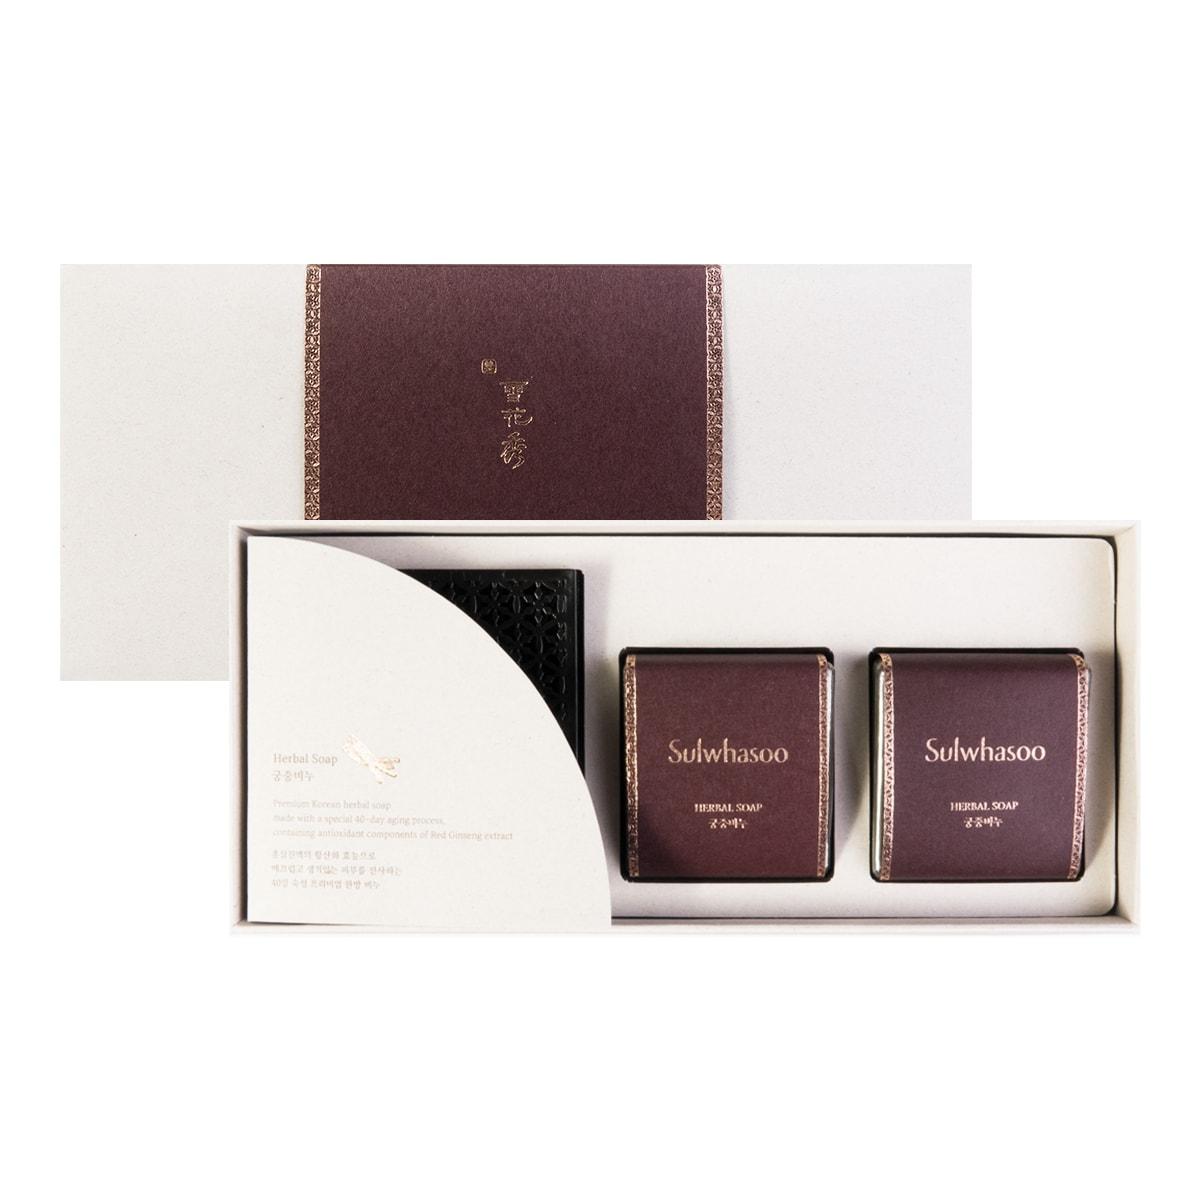 SULWHASOO Herbal Soap Set 100g*2